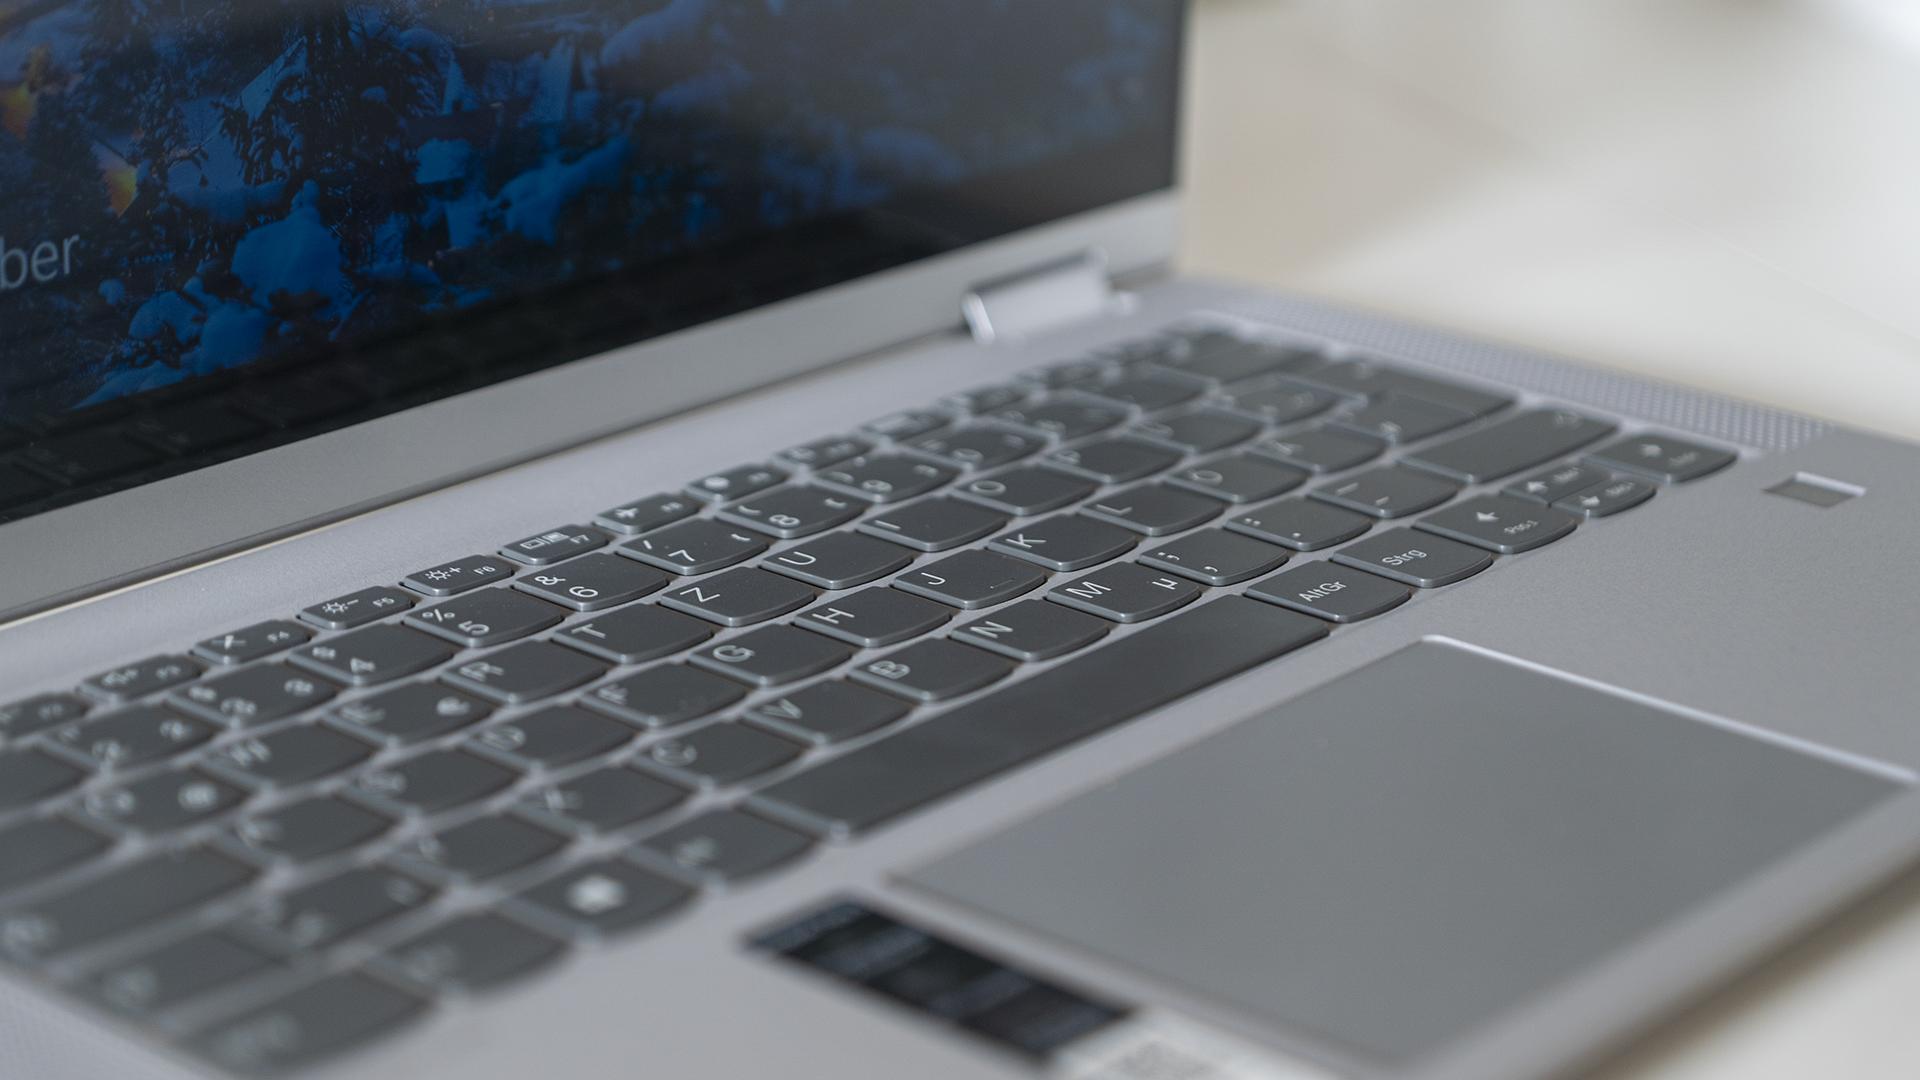 Lenovo IdeaPad Flex 5 Keyboard Tastatur Close Up